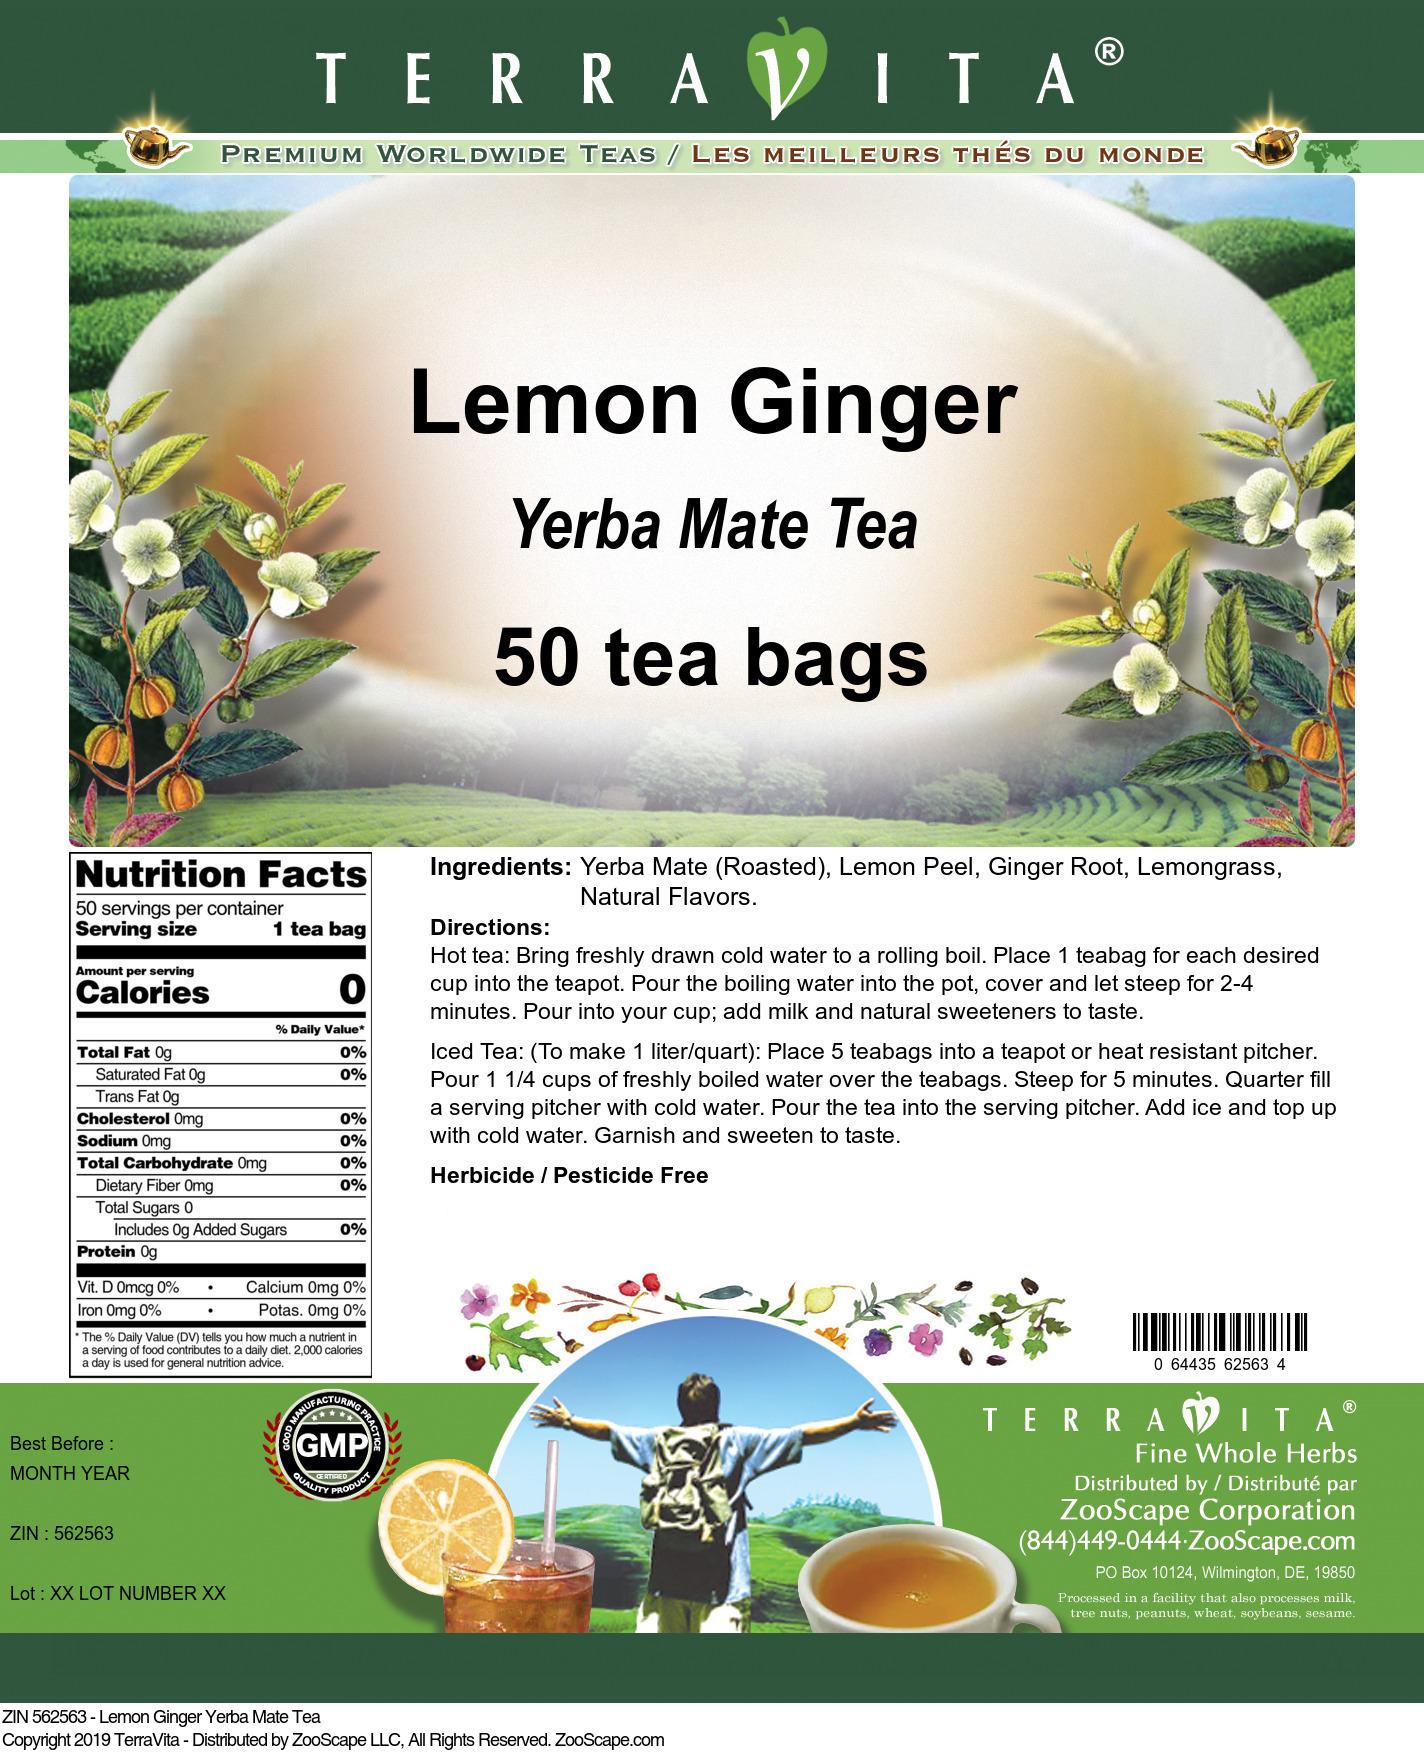 Lemon Ginger Yerba Mate